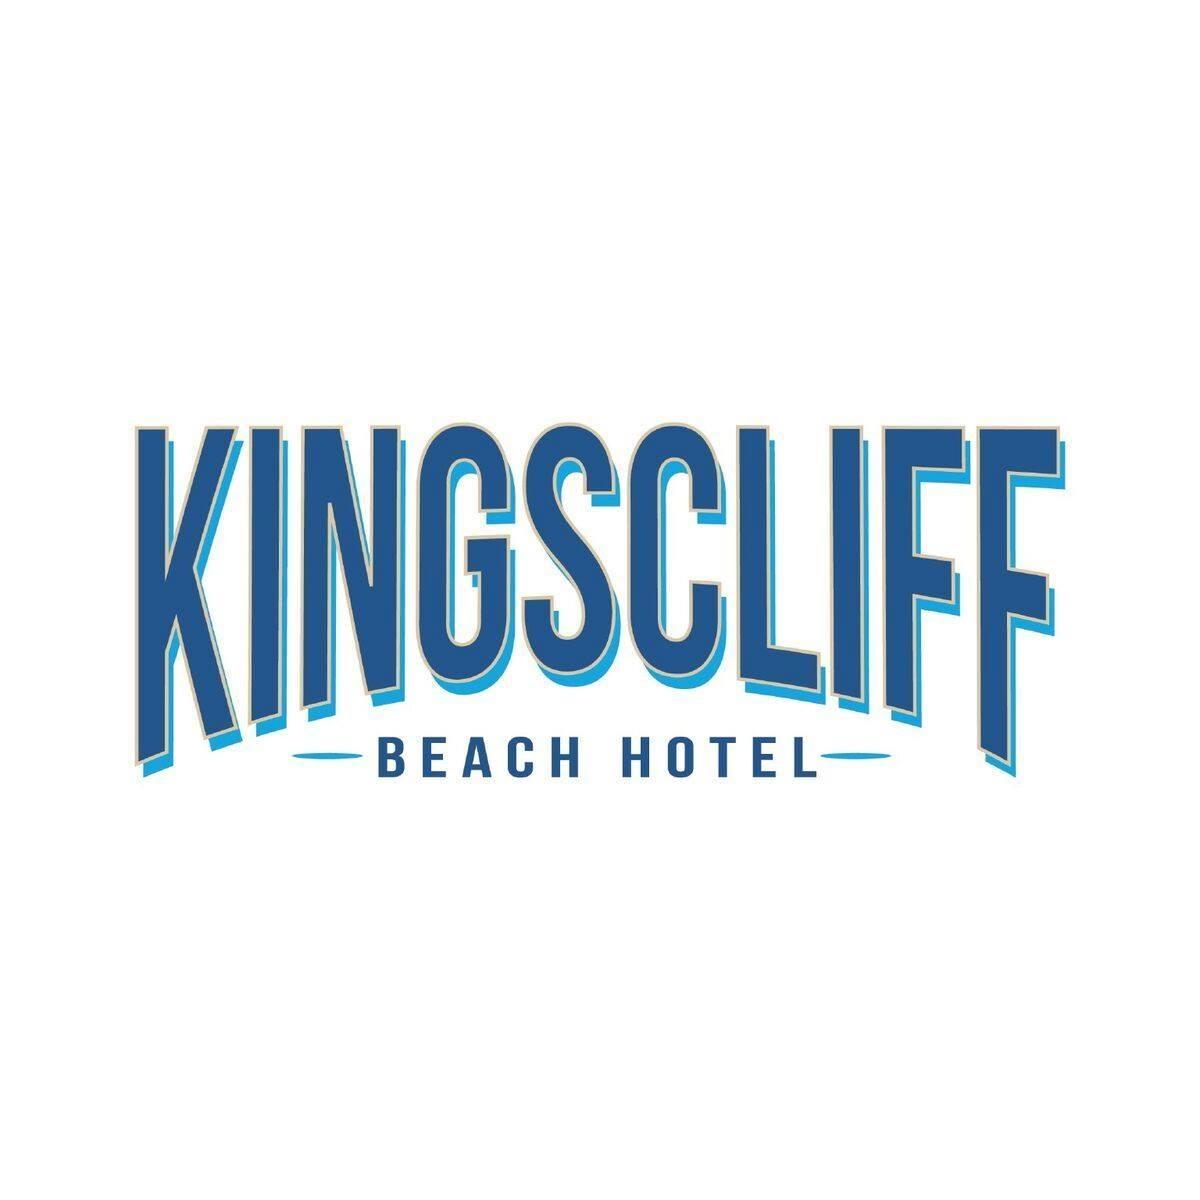 Kingscliff Beach Hotel